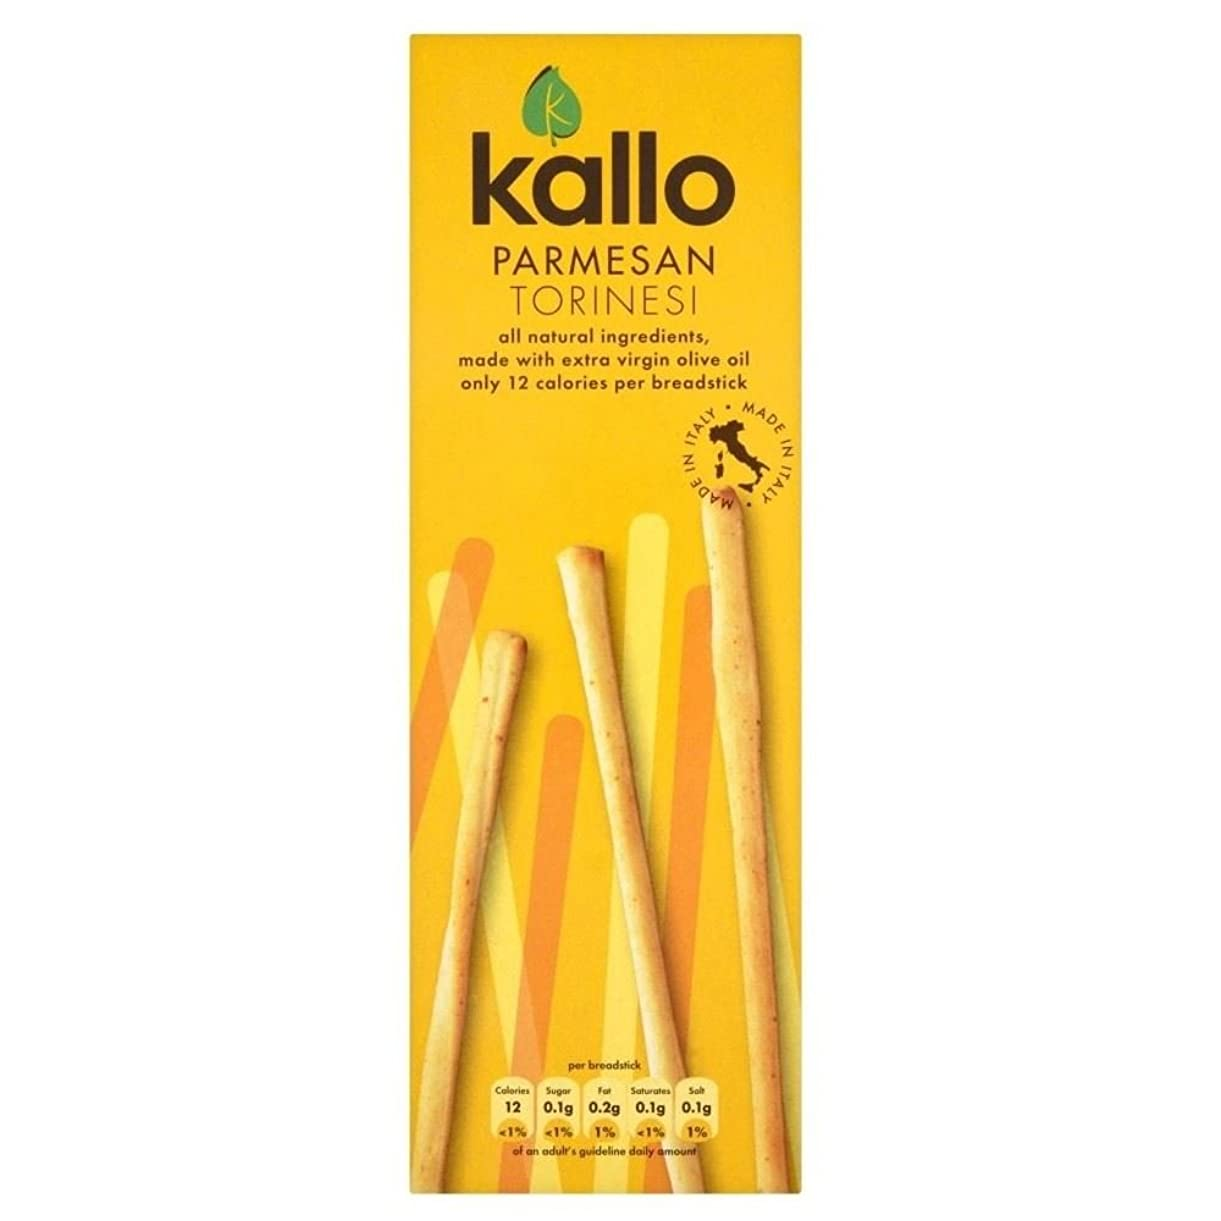 Kallo Torinesi Thin Breadsticks Parmesan Cheese (125g) - Pack of 6 jpmoq8817